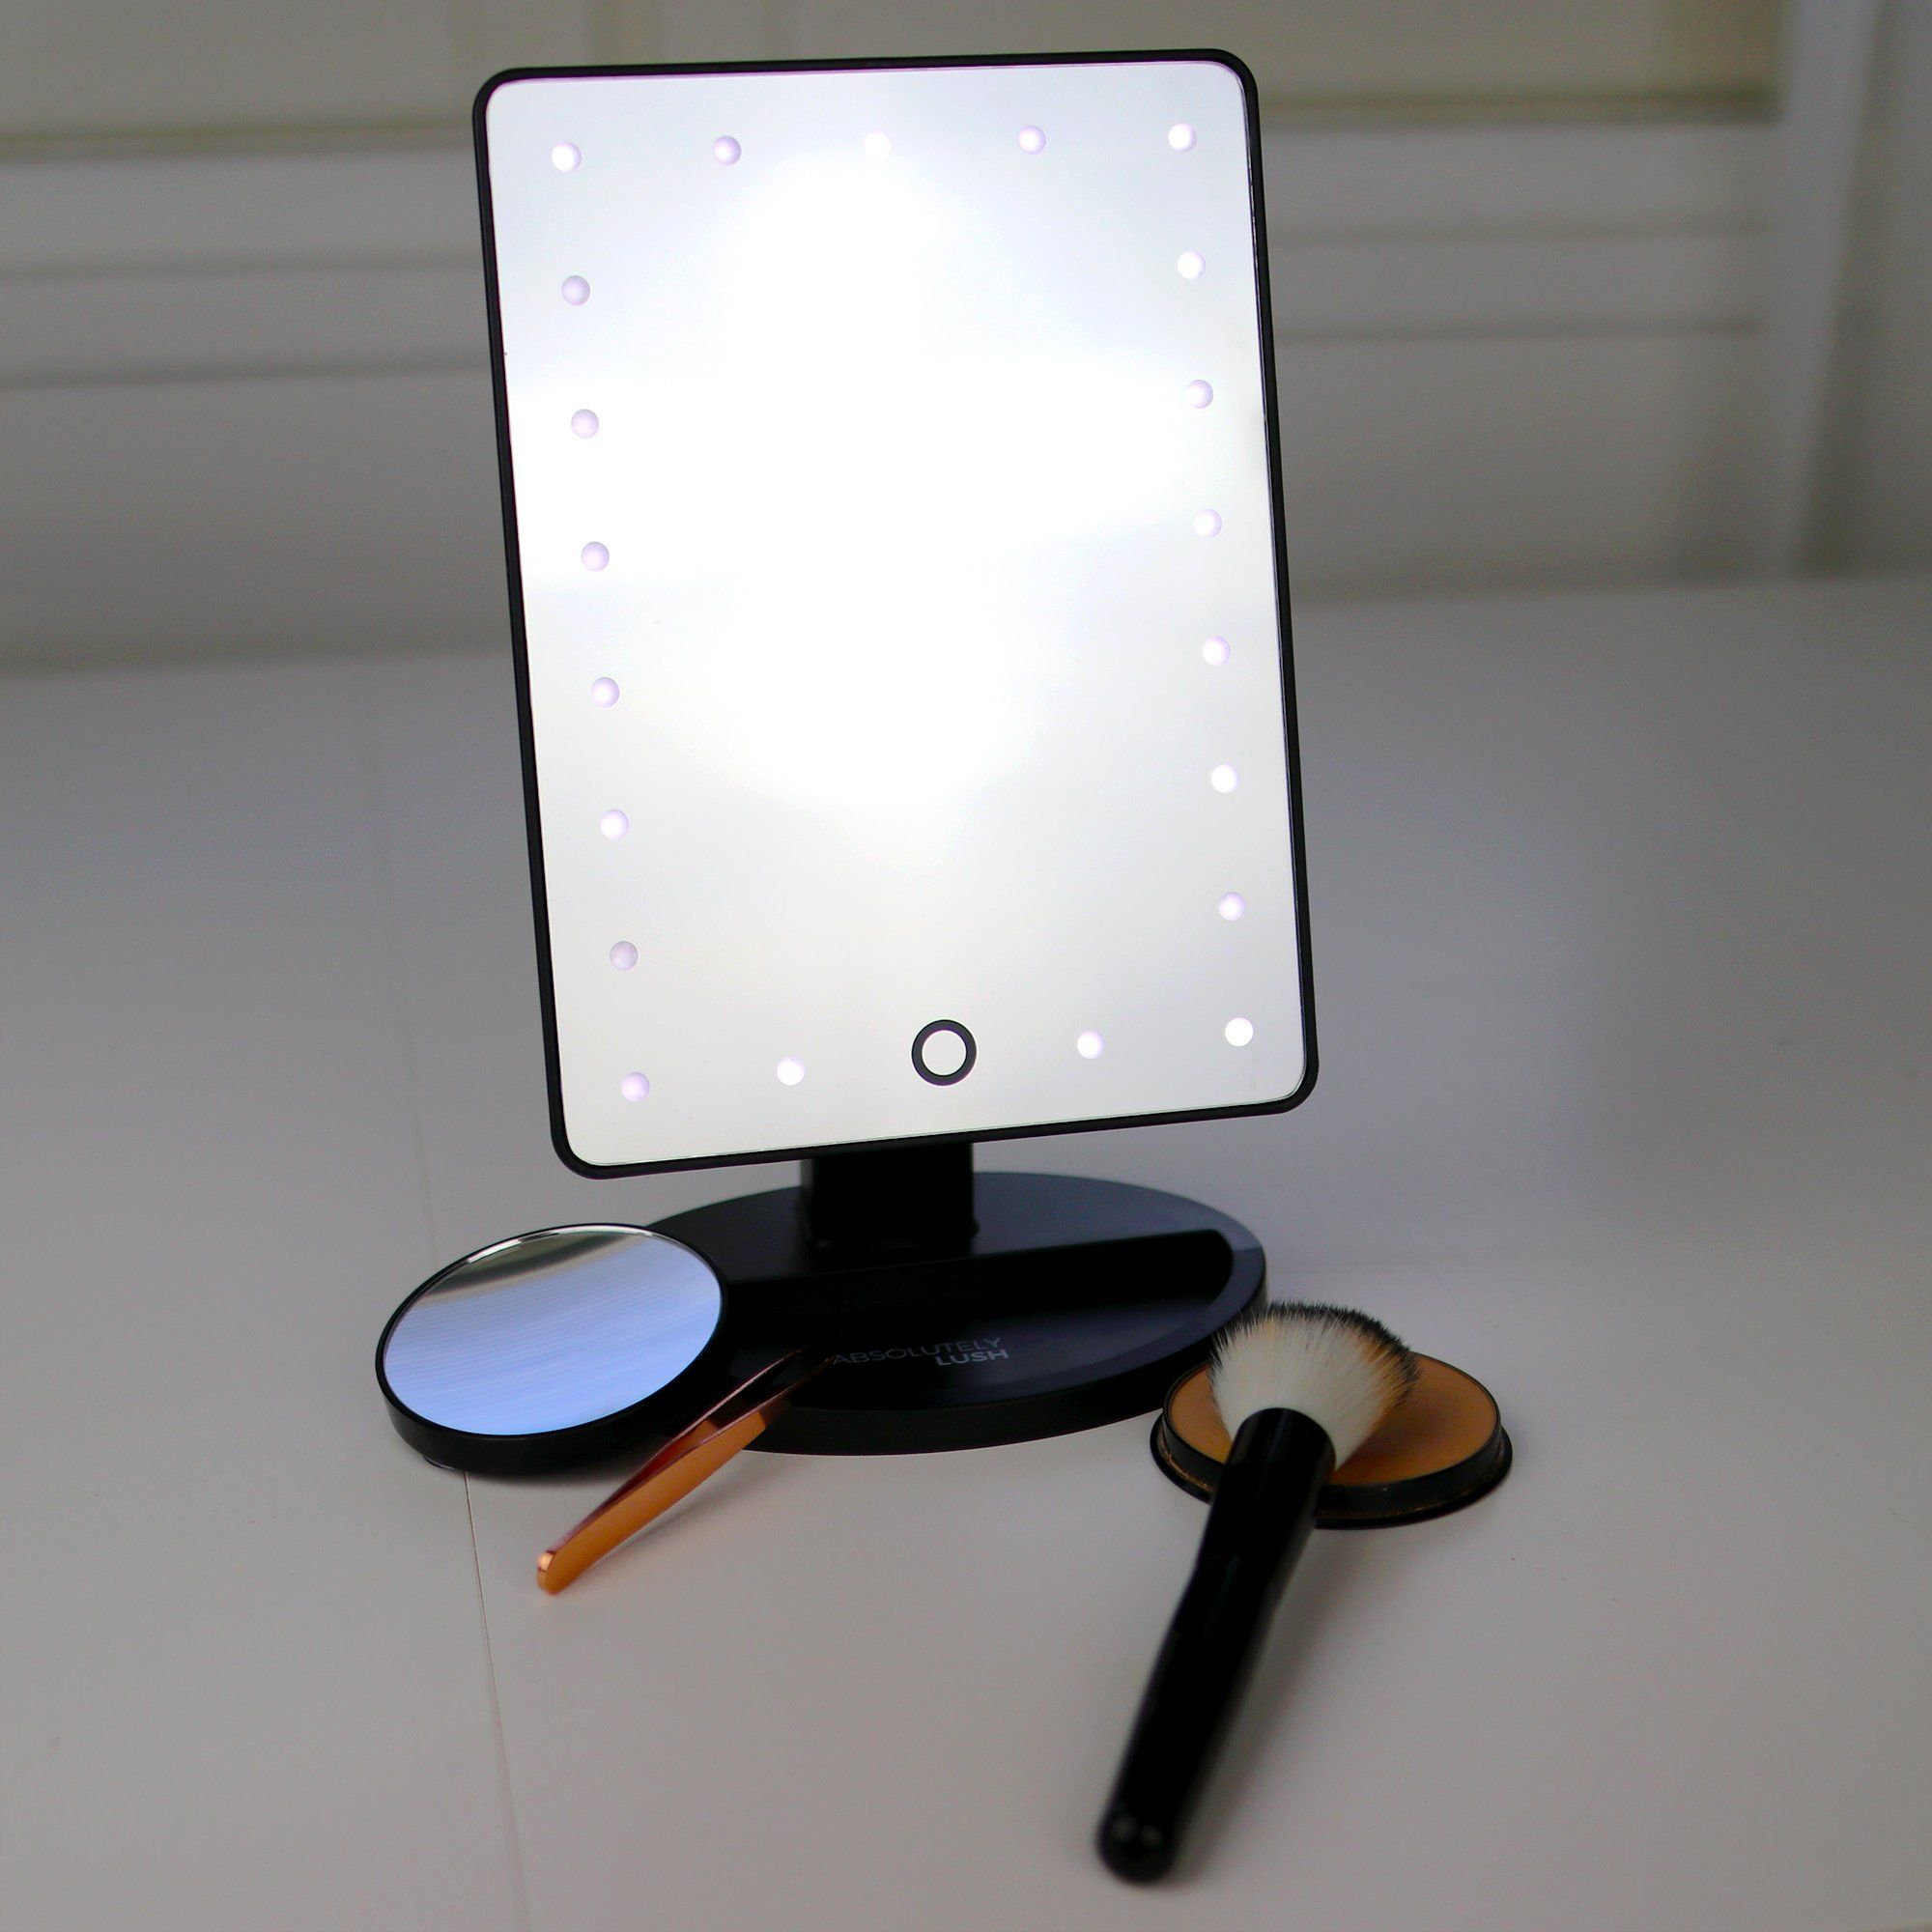 Natural daylight lighted makeup mirror vanity mirror with touch natural daylight lighted makeup mirror vanity mirror with touch screen dimming detachable 10x magnification spot aloadofball Choice Image